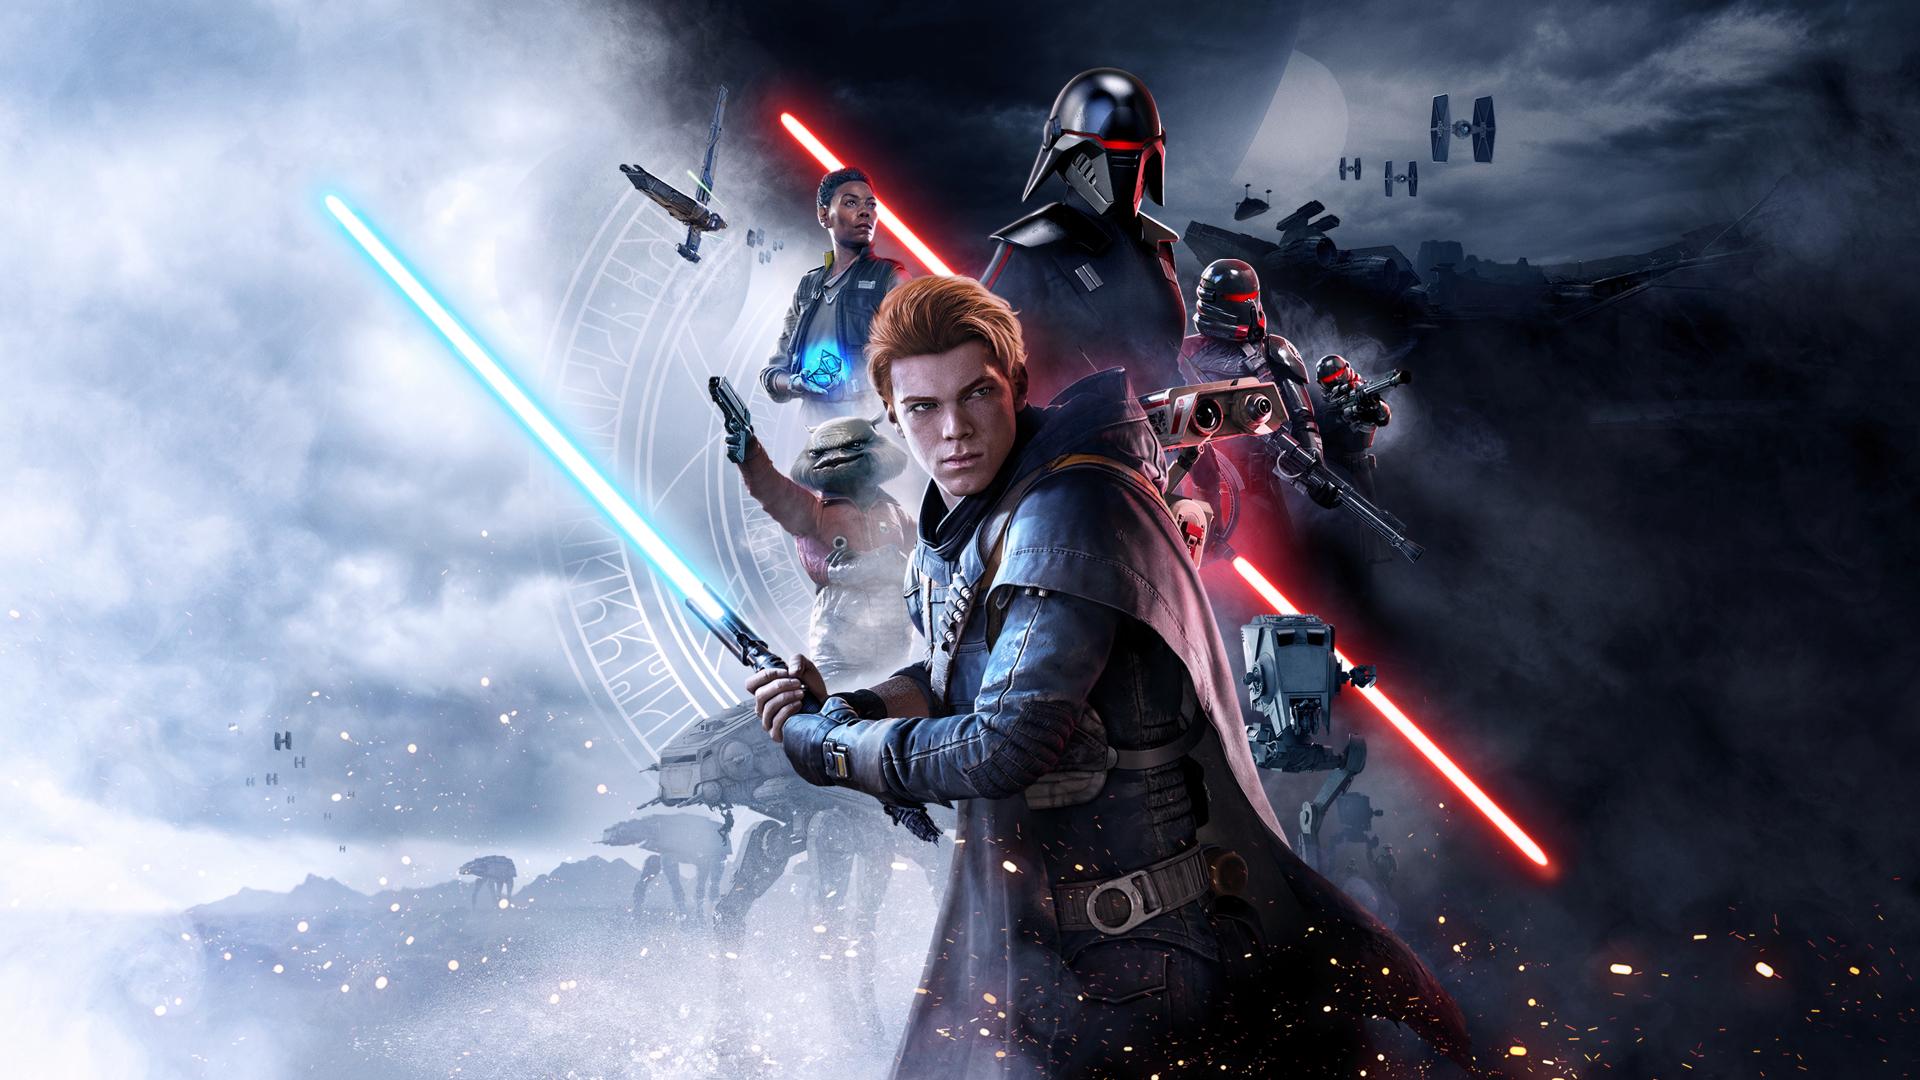 1920x1080 Star Wars Jedi Fallen Order Poster 2019 1080p Laptop